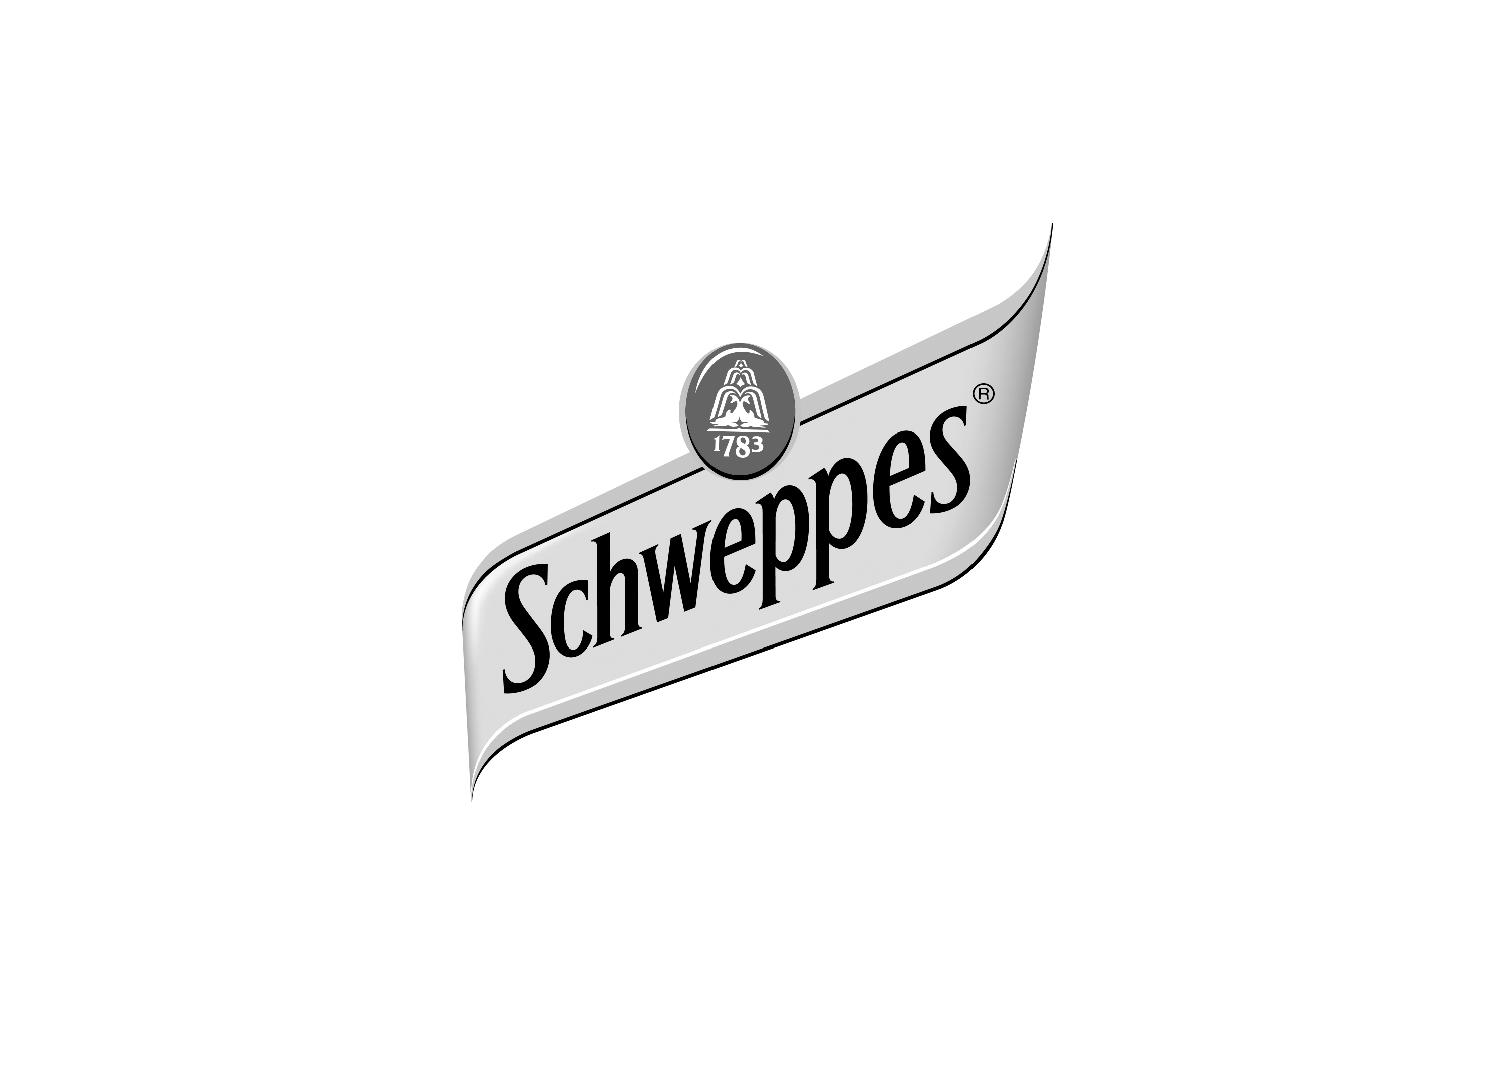 Schweppes-01.jpg